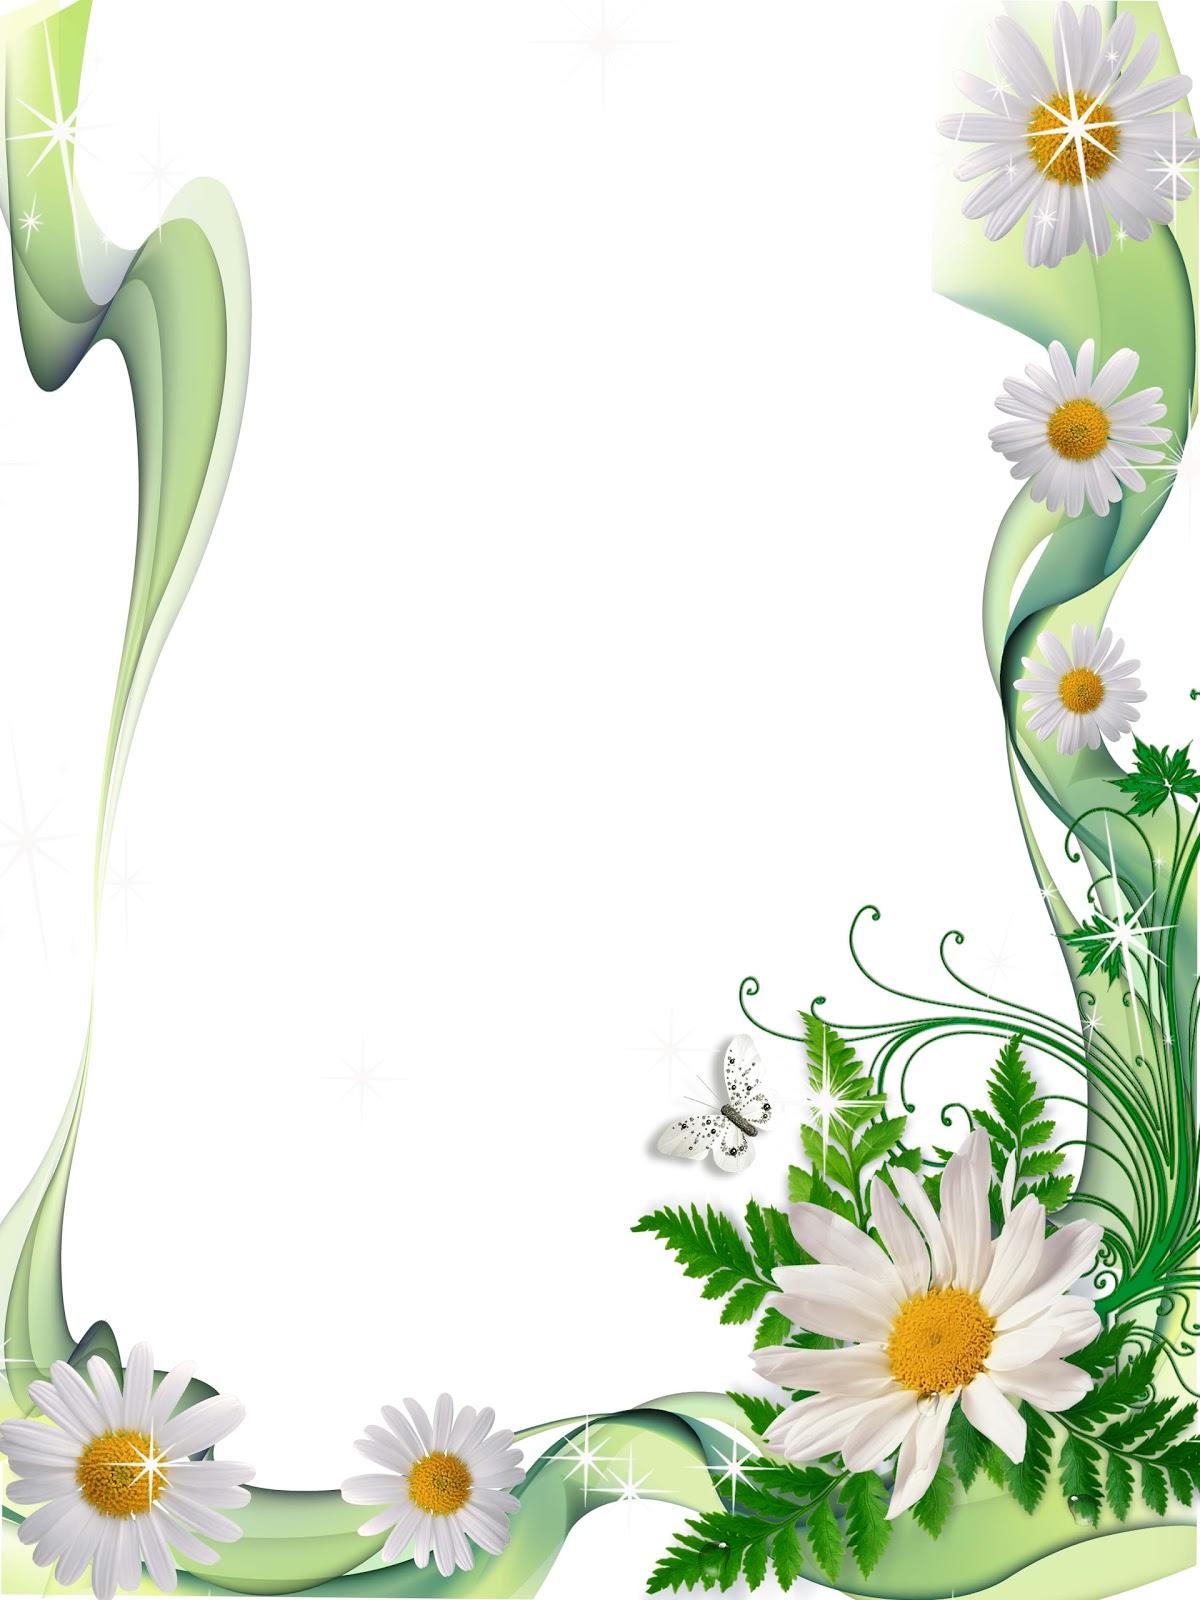 Marcadores: Downloads , Flor , Molduras